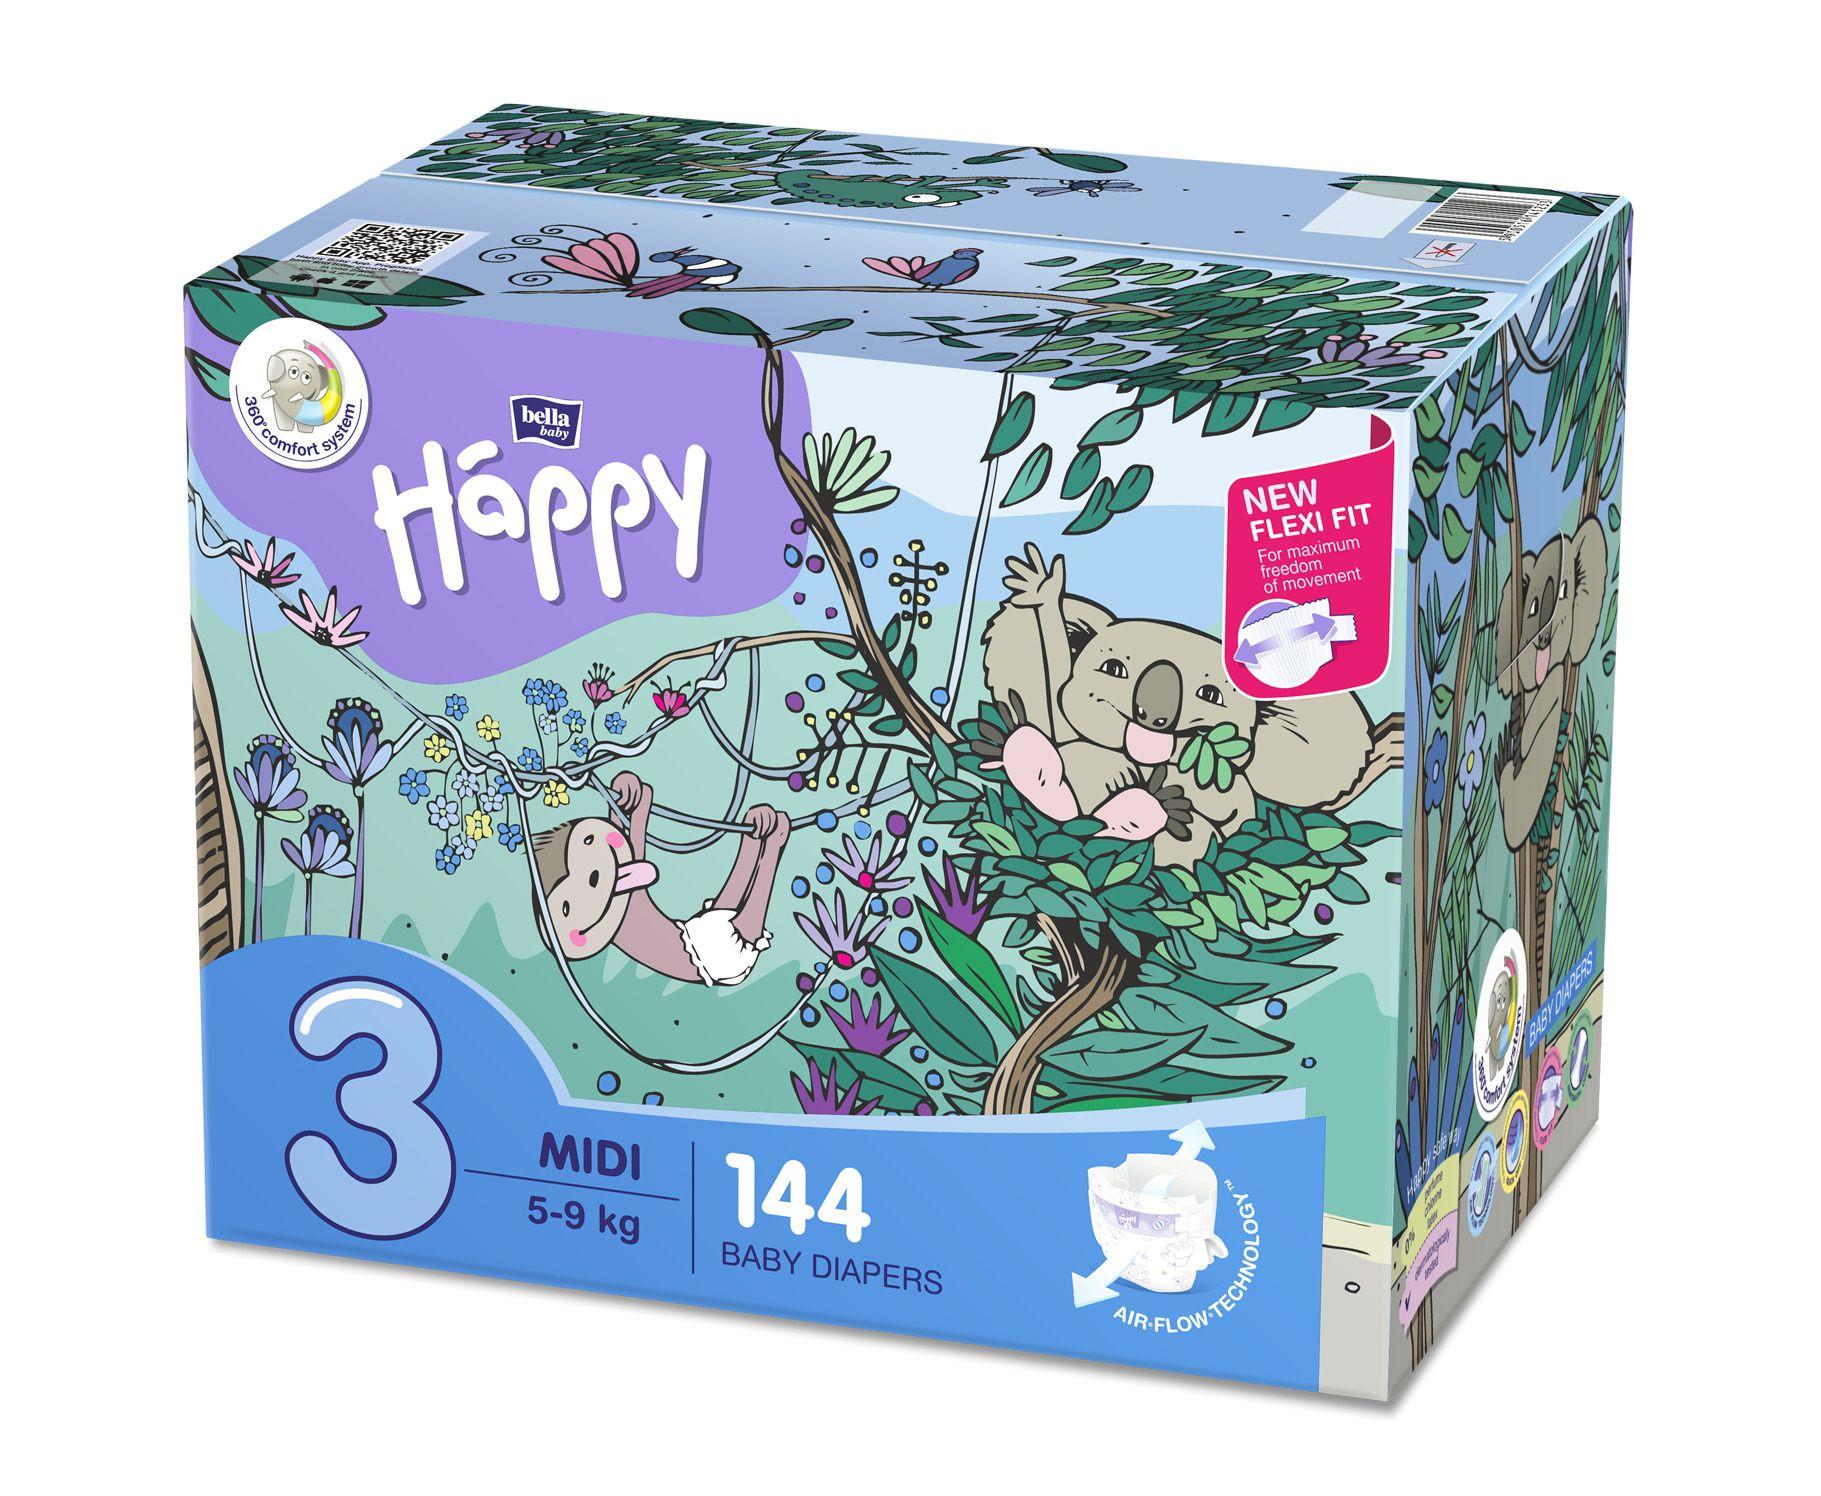 Bella Baby Happy Midi 5-9 kg dětské plenky box 2x72 ks